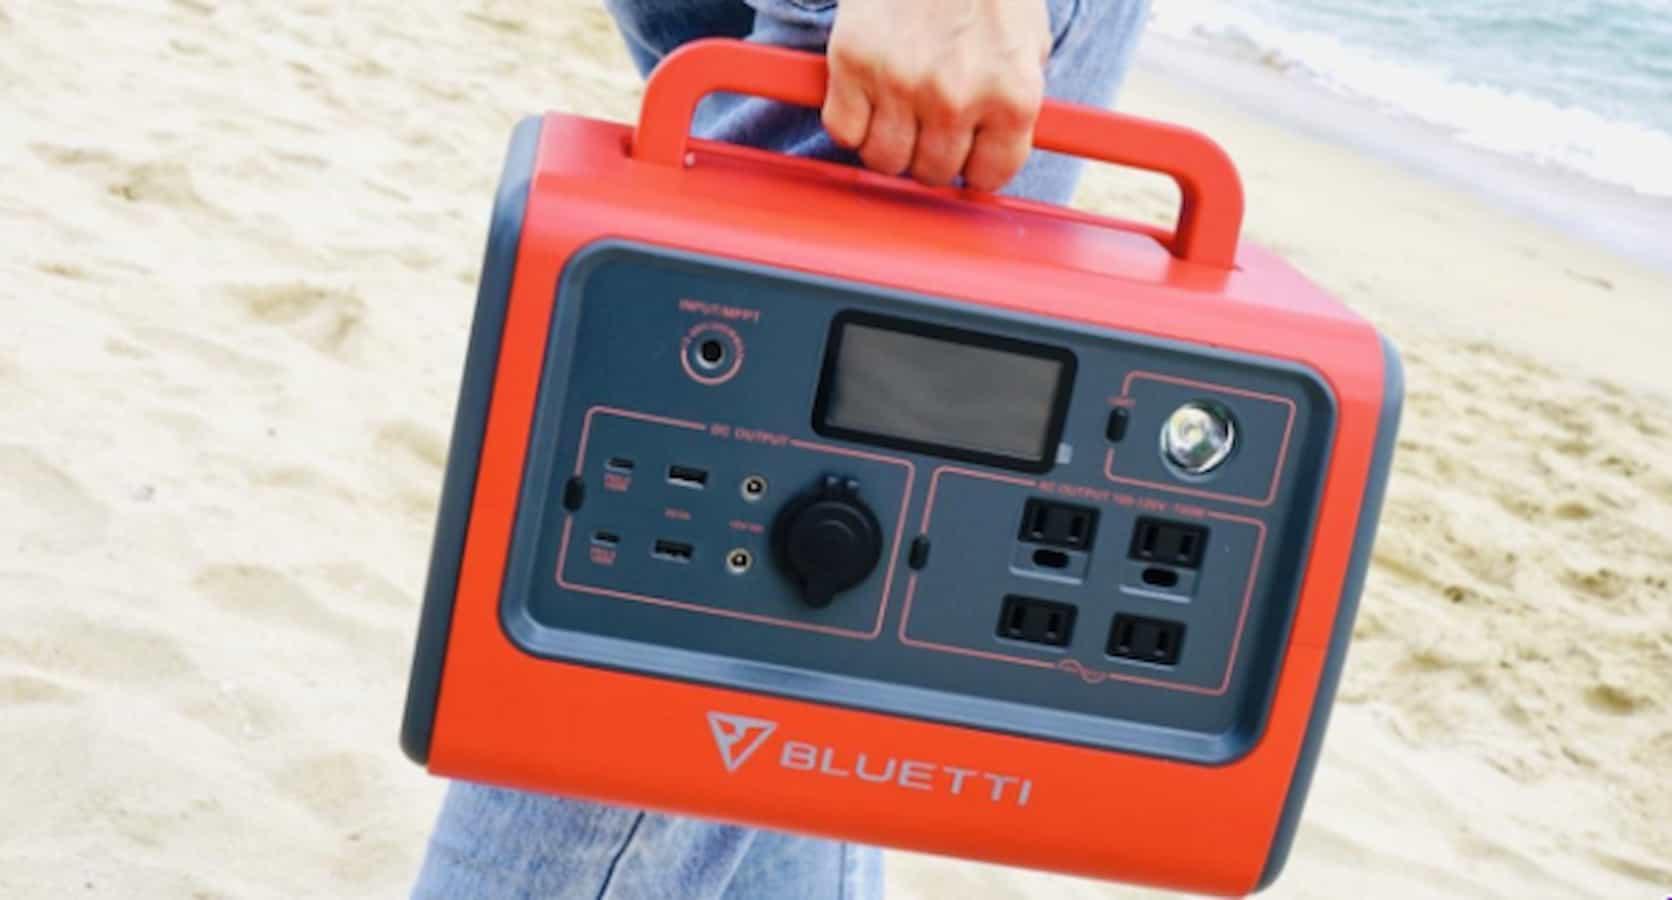 bluetti charging station